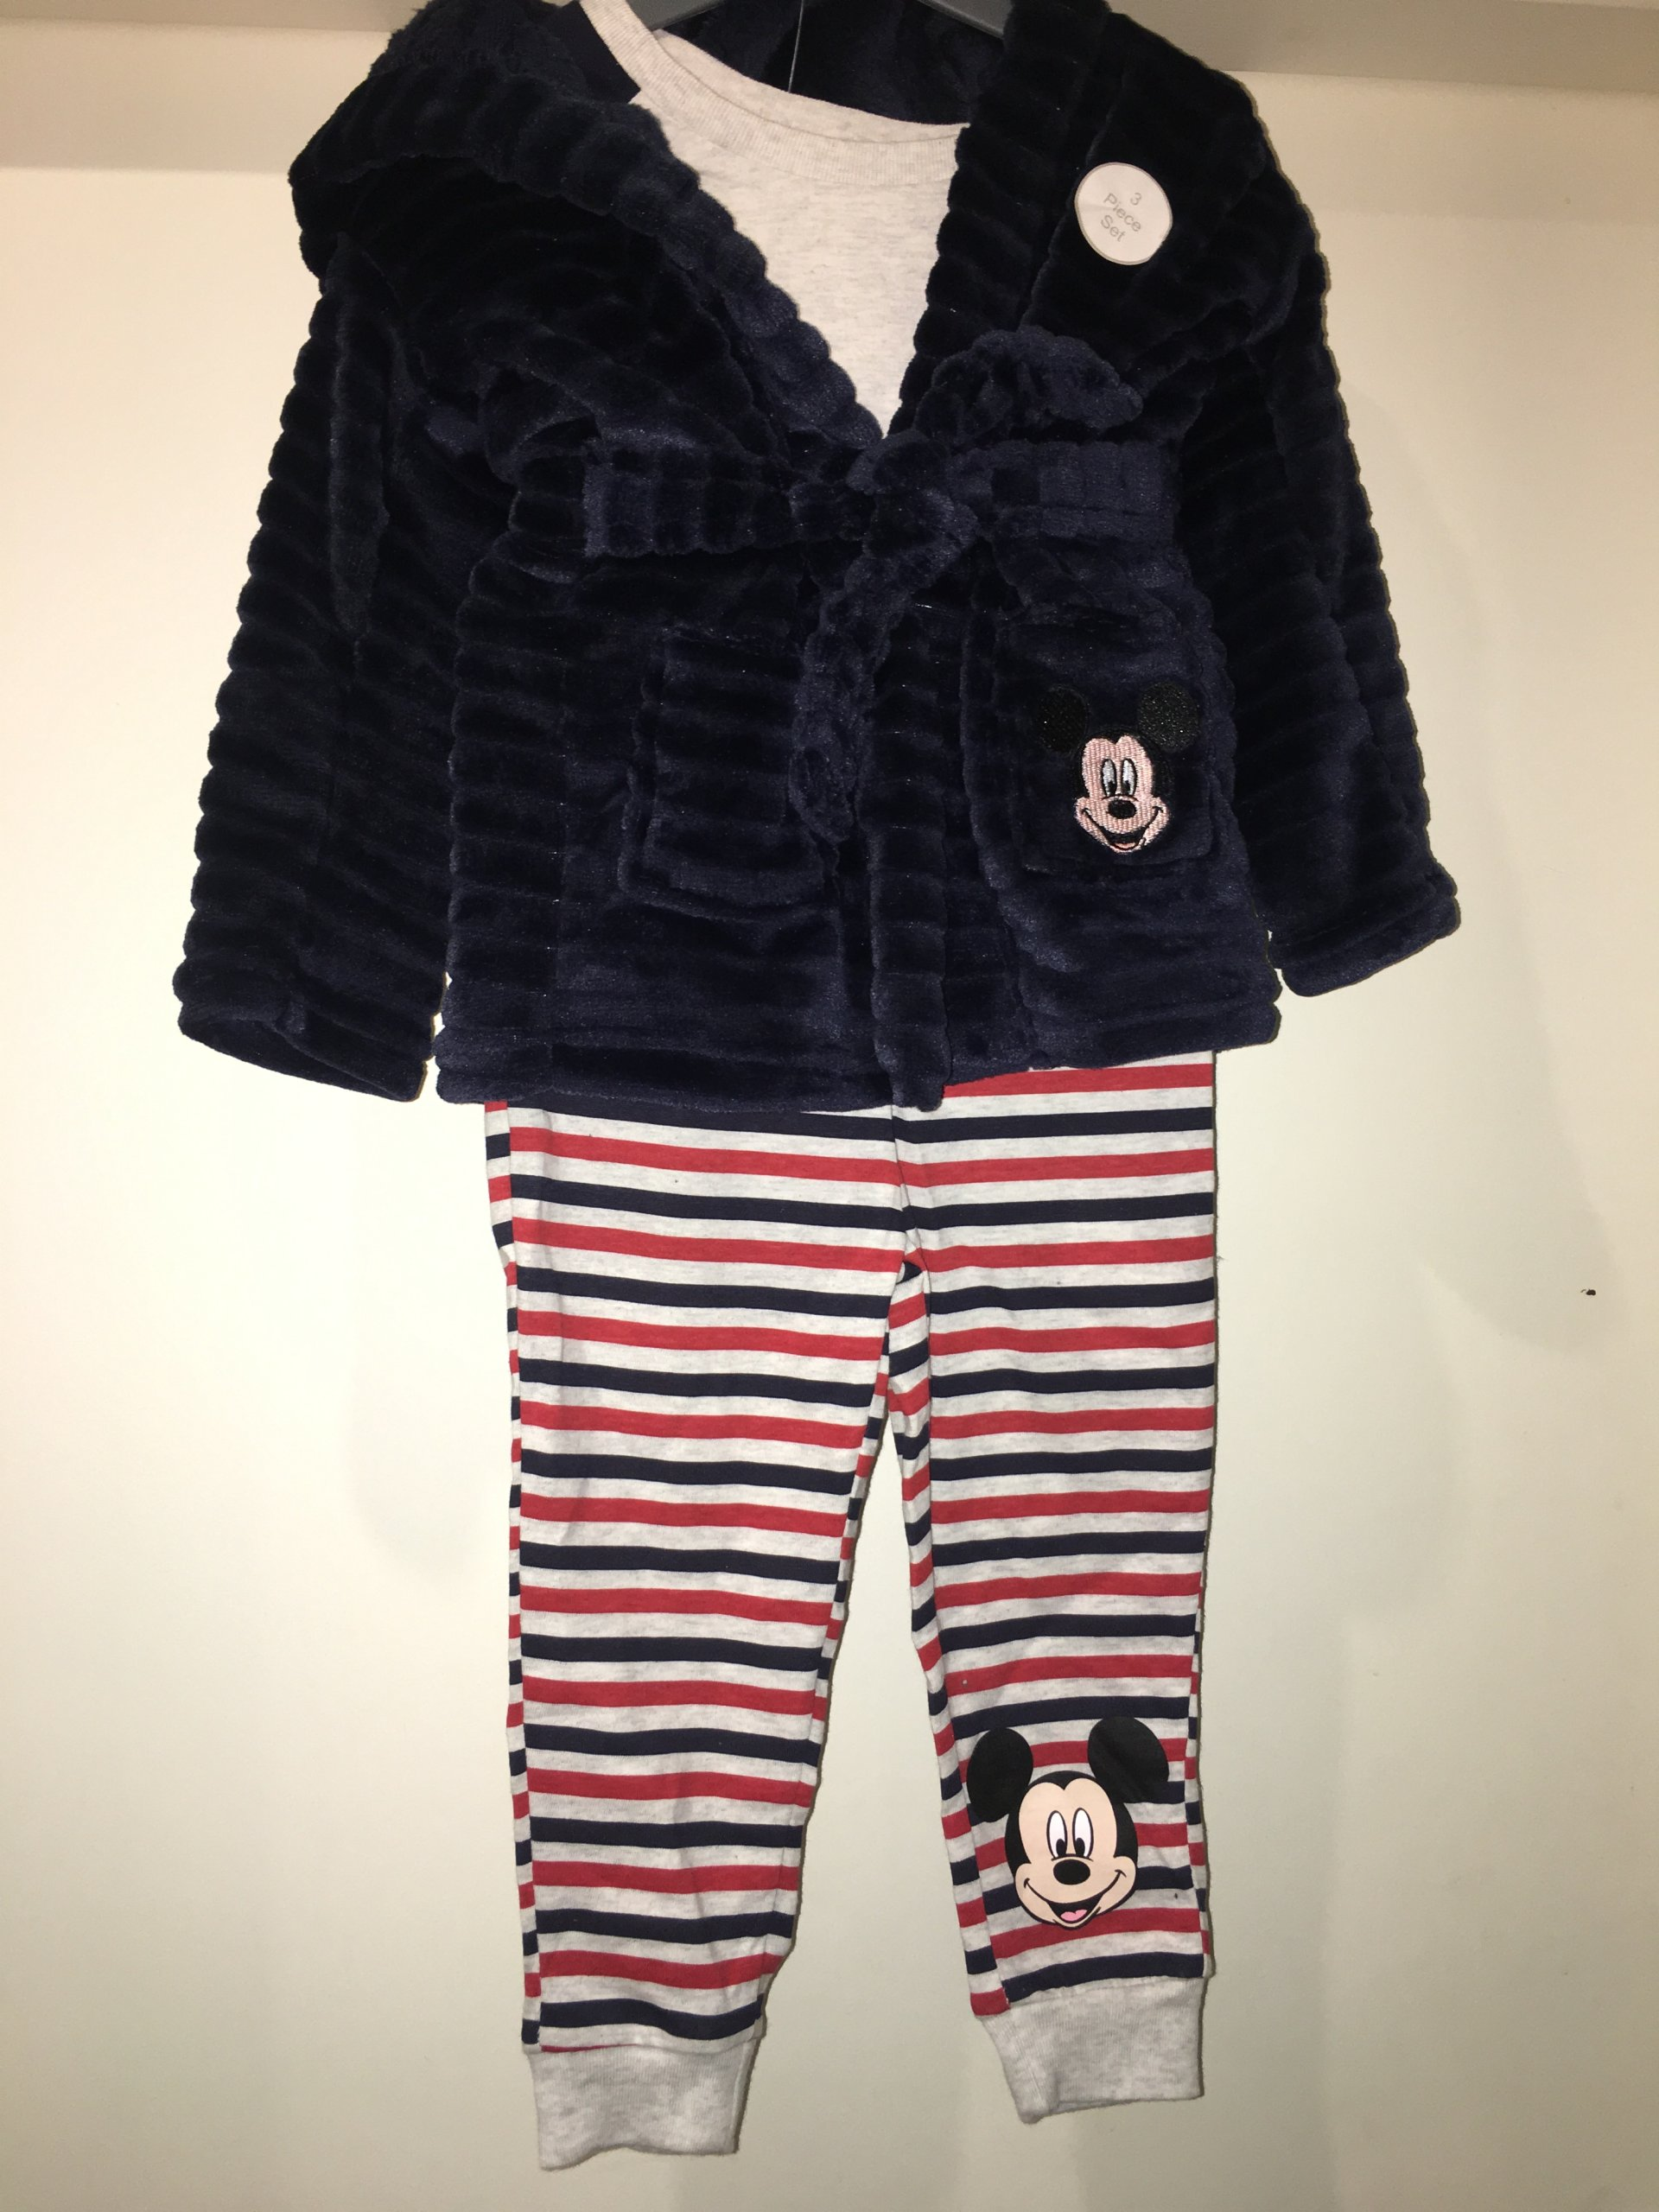 Piżamka + Szlafrok dla chłopca PRIMARK 92cm